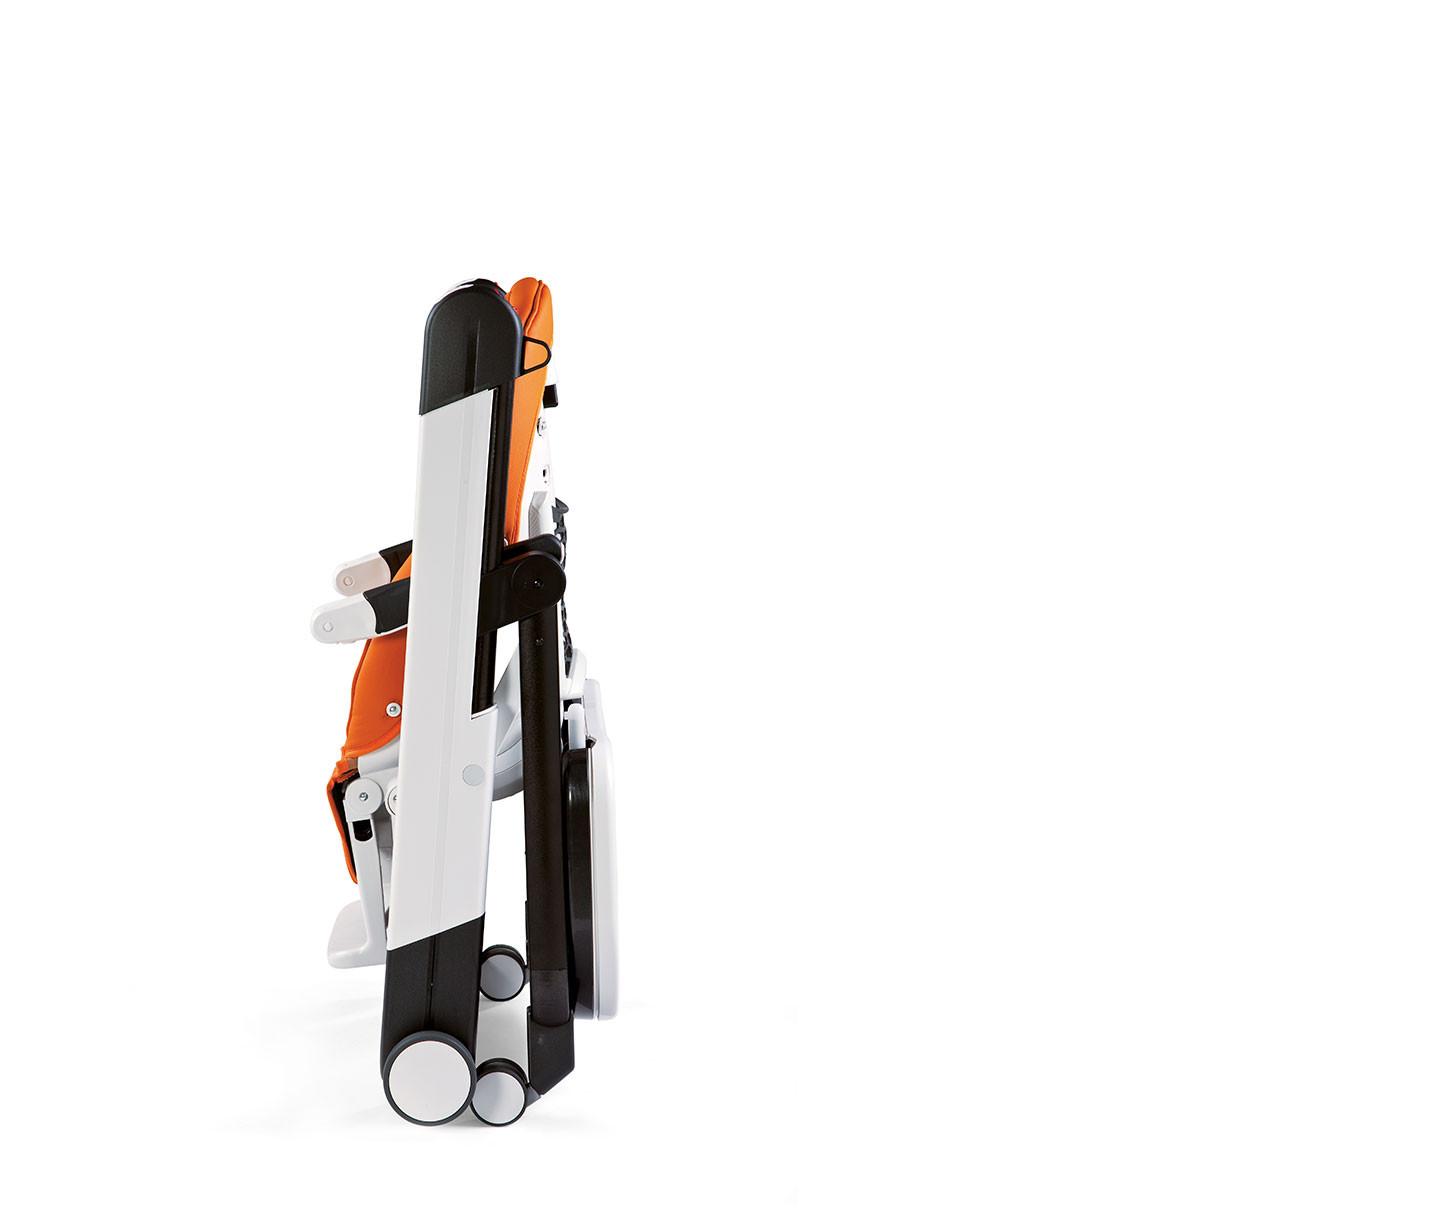 Peg perego high chair siesta - Peg Perego Team All In One Stroller